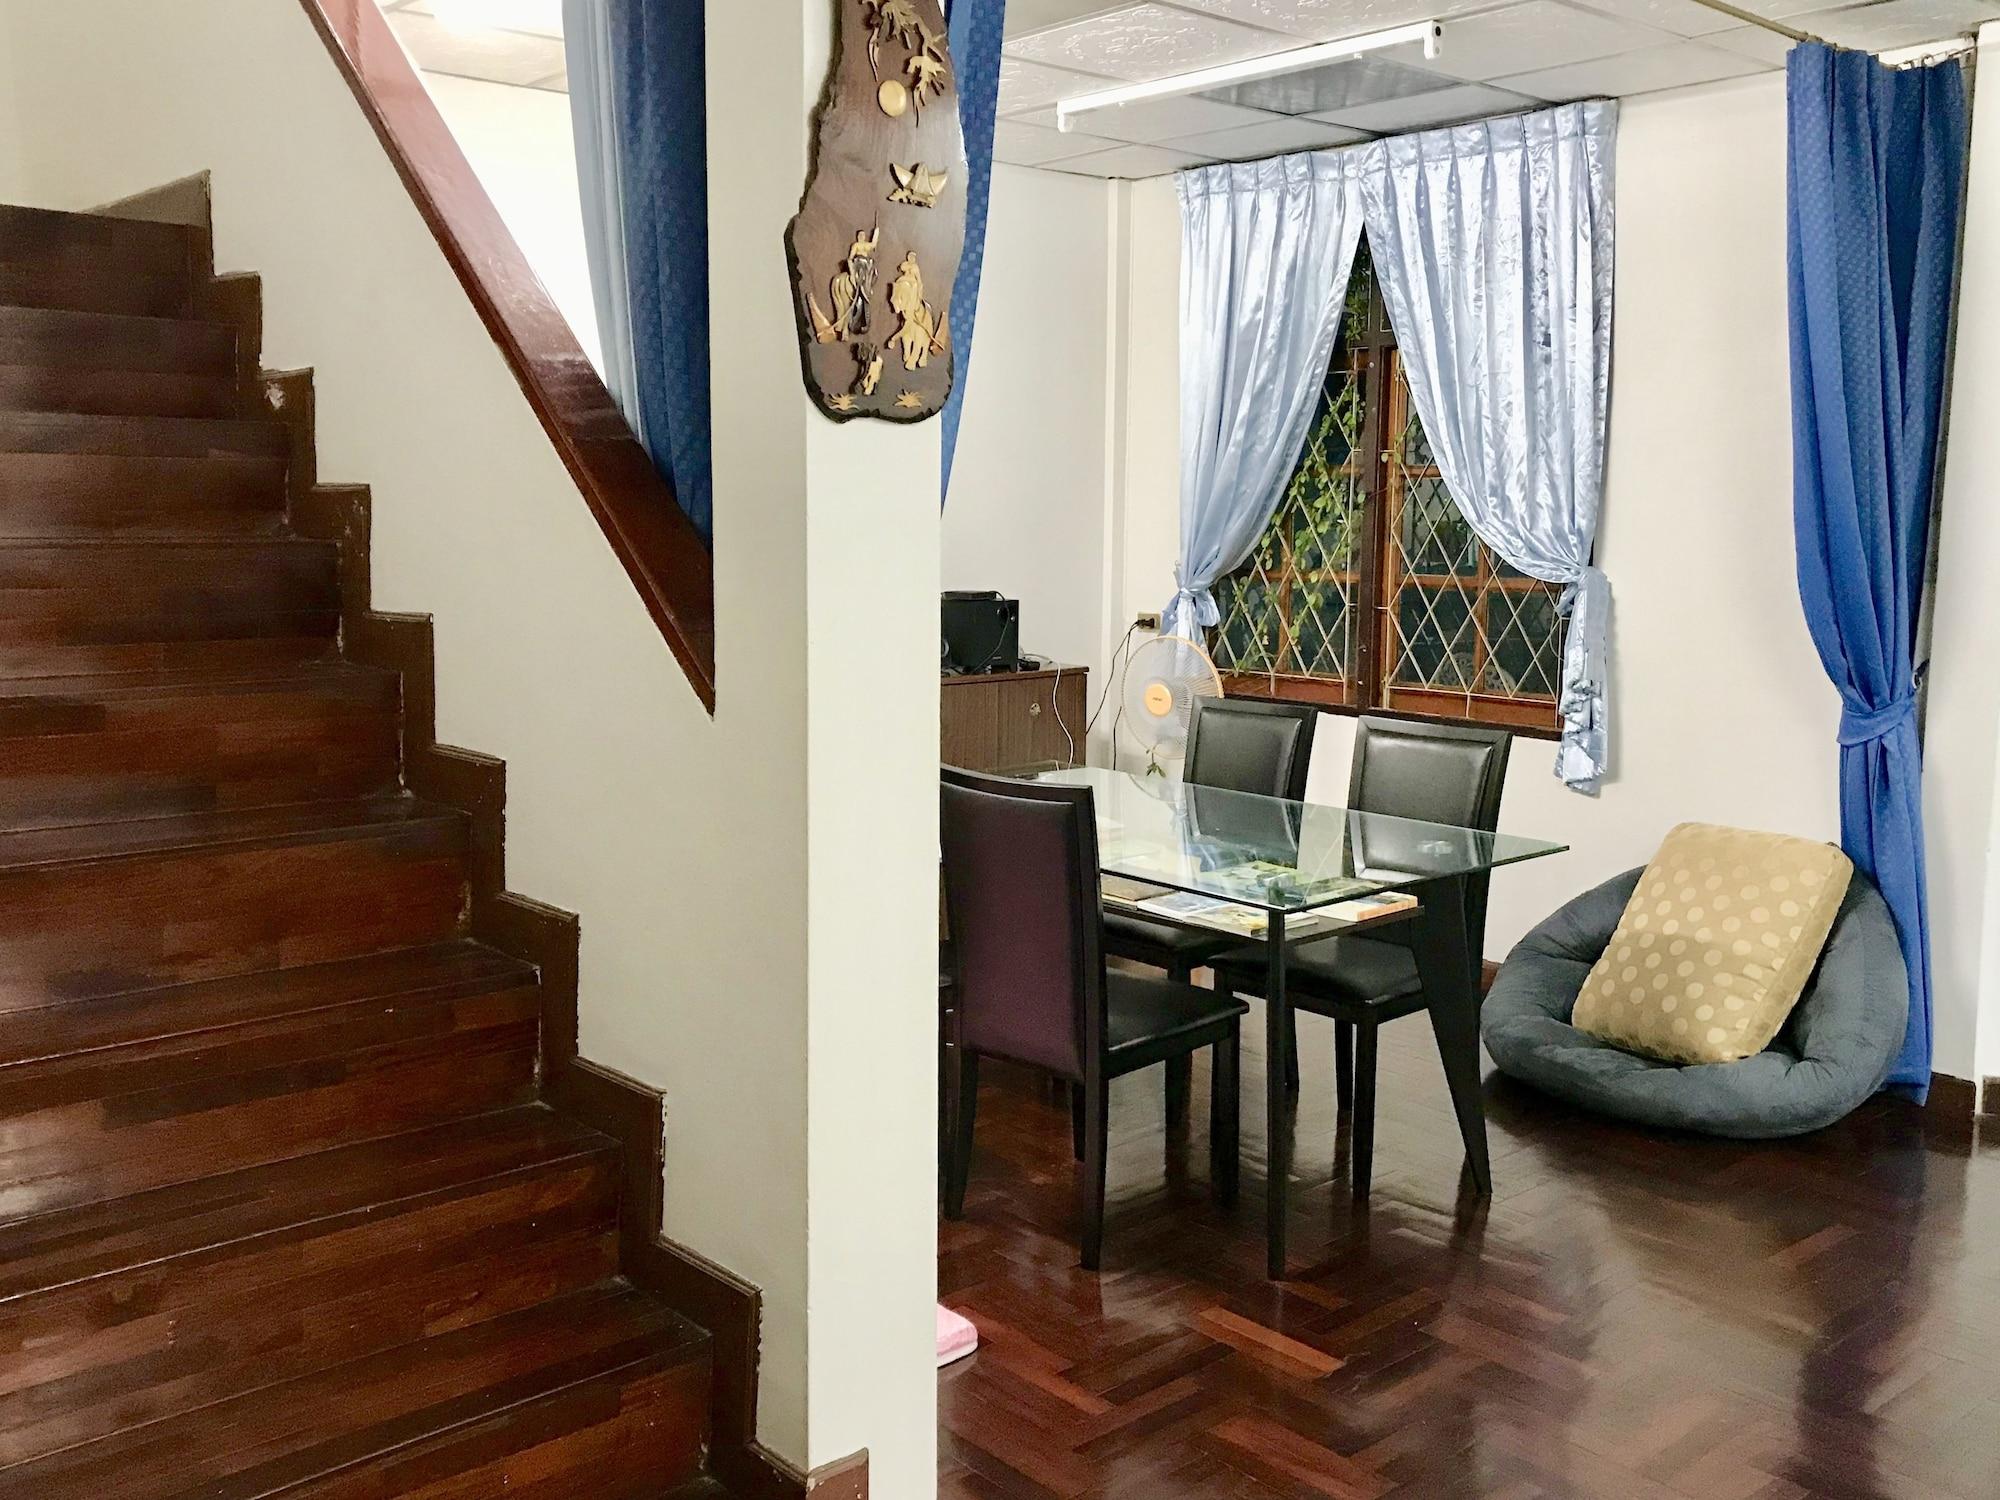 Sira's House, Din Dang